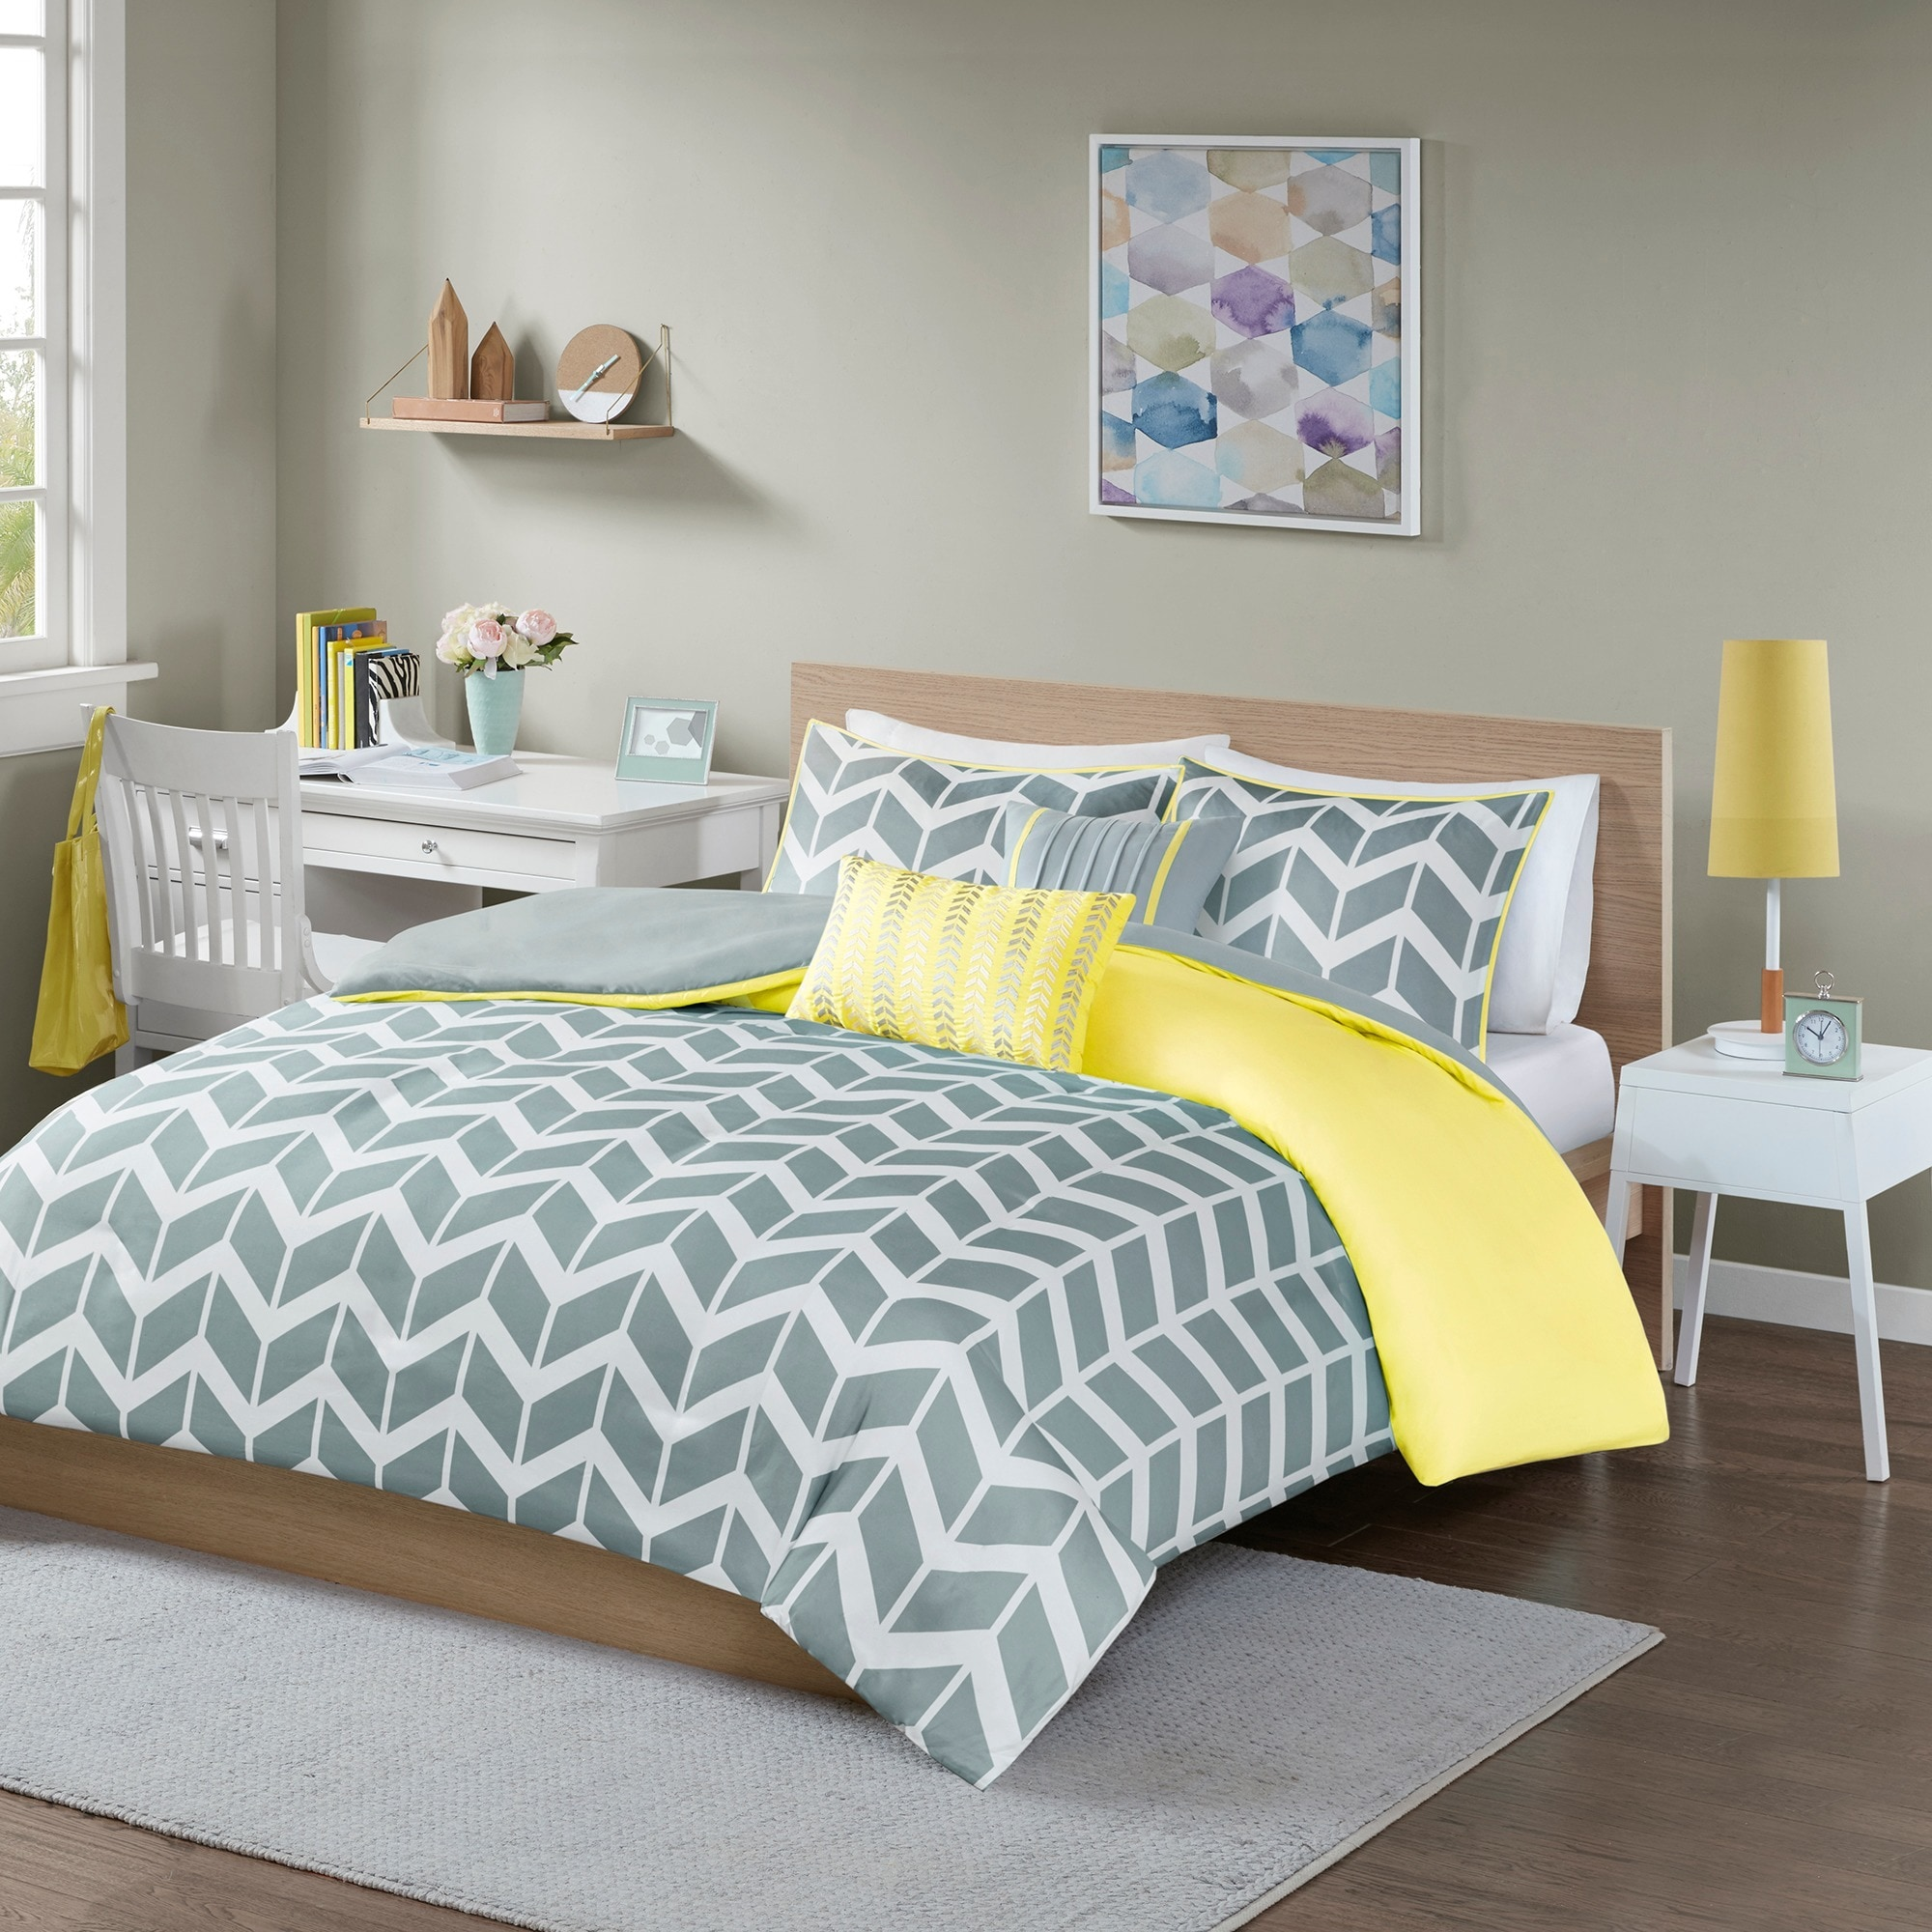 head yellow bed citrus bedeck duvet scion at of pillowcase fox mr in bedding